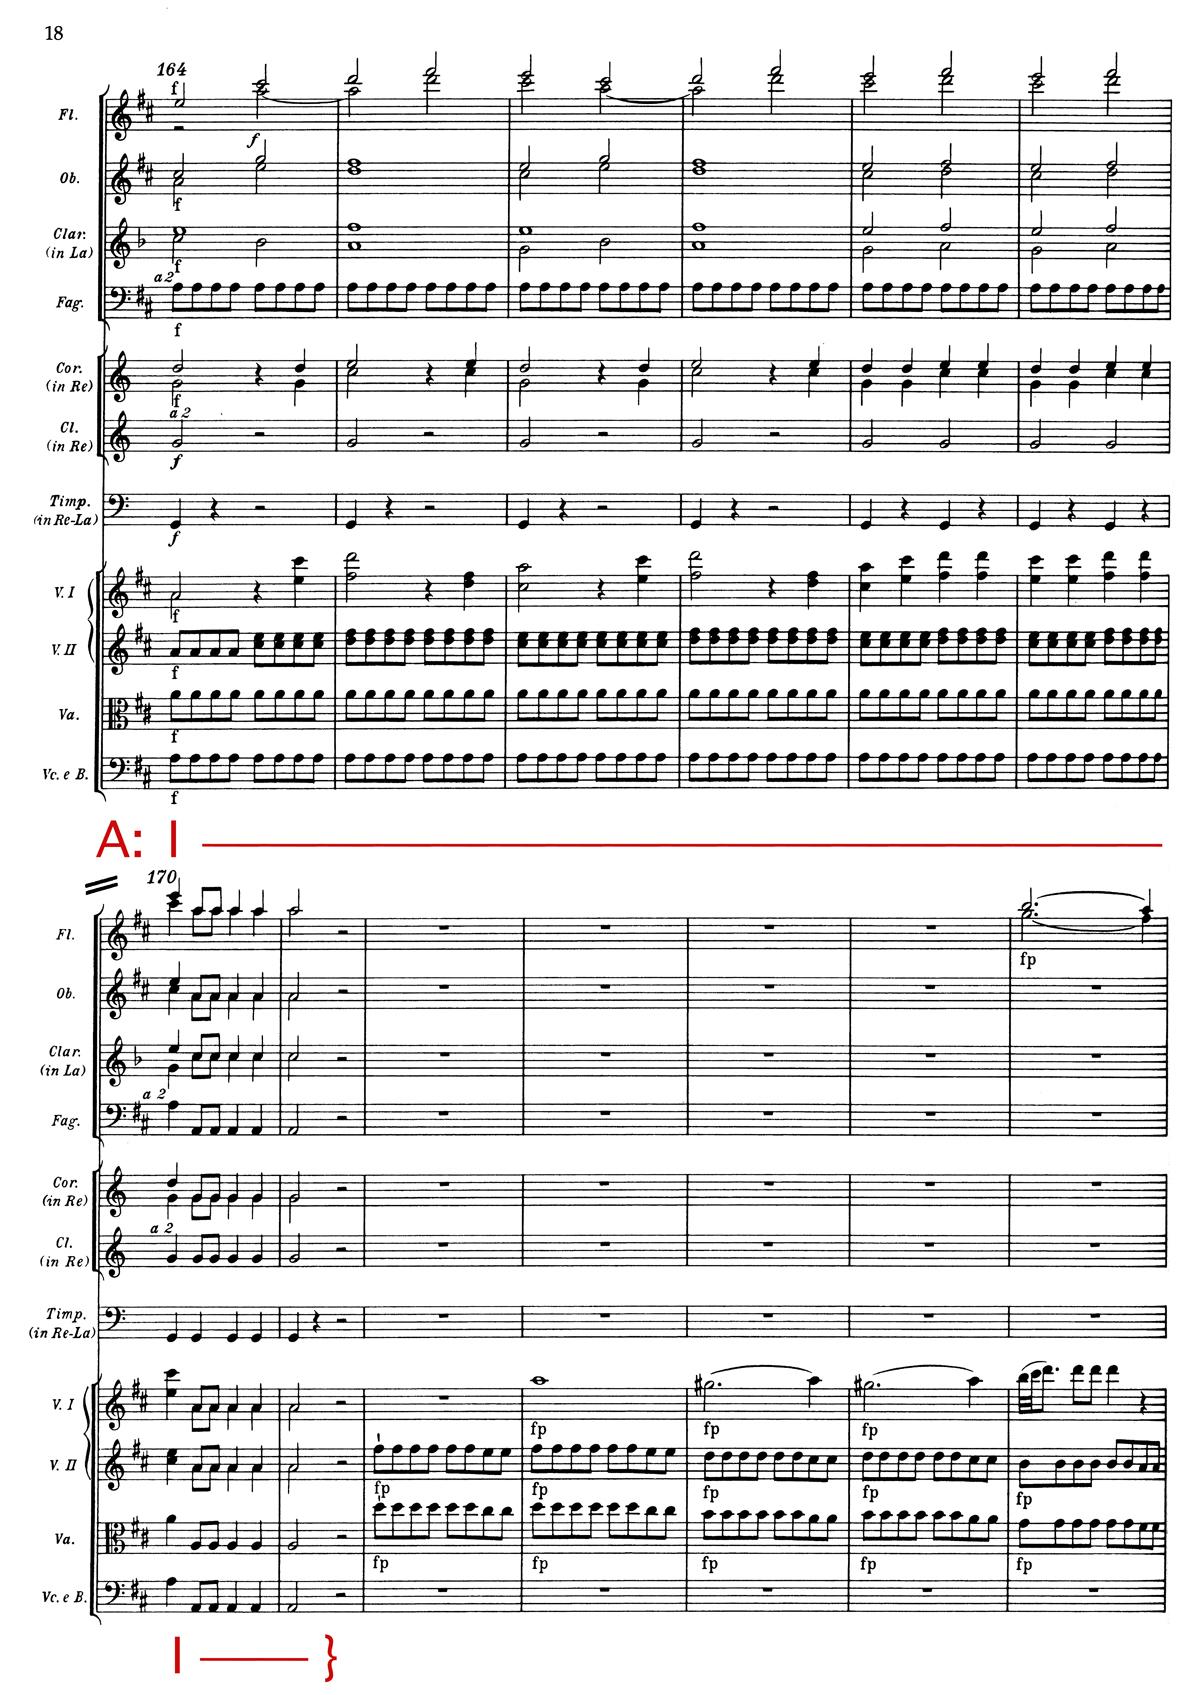 Mozart_Figaro_Theory_7.jpg